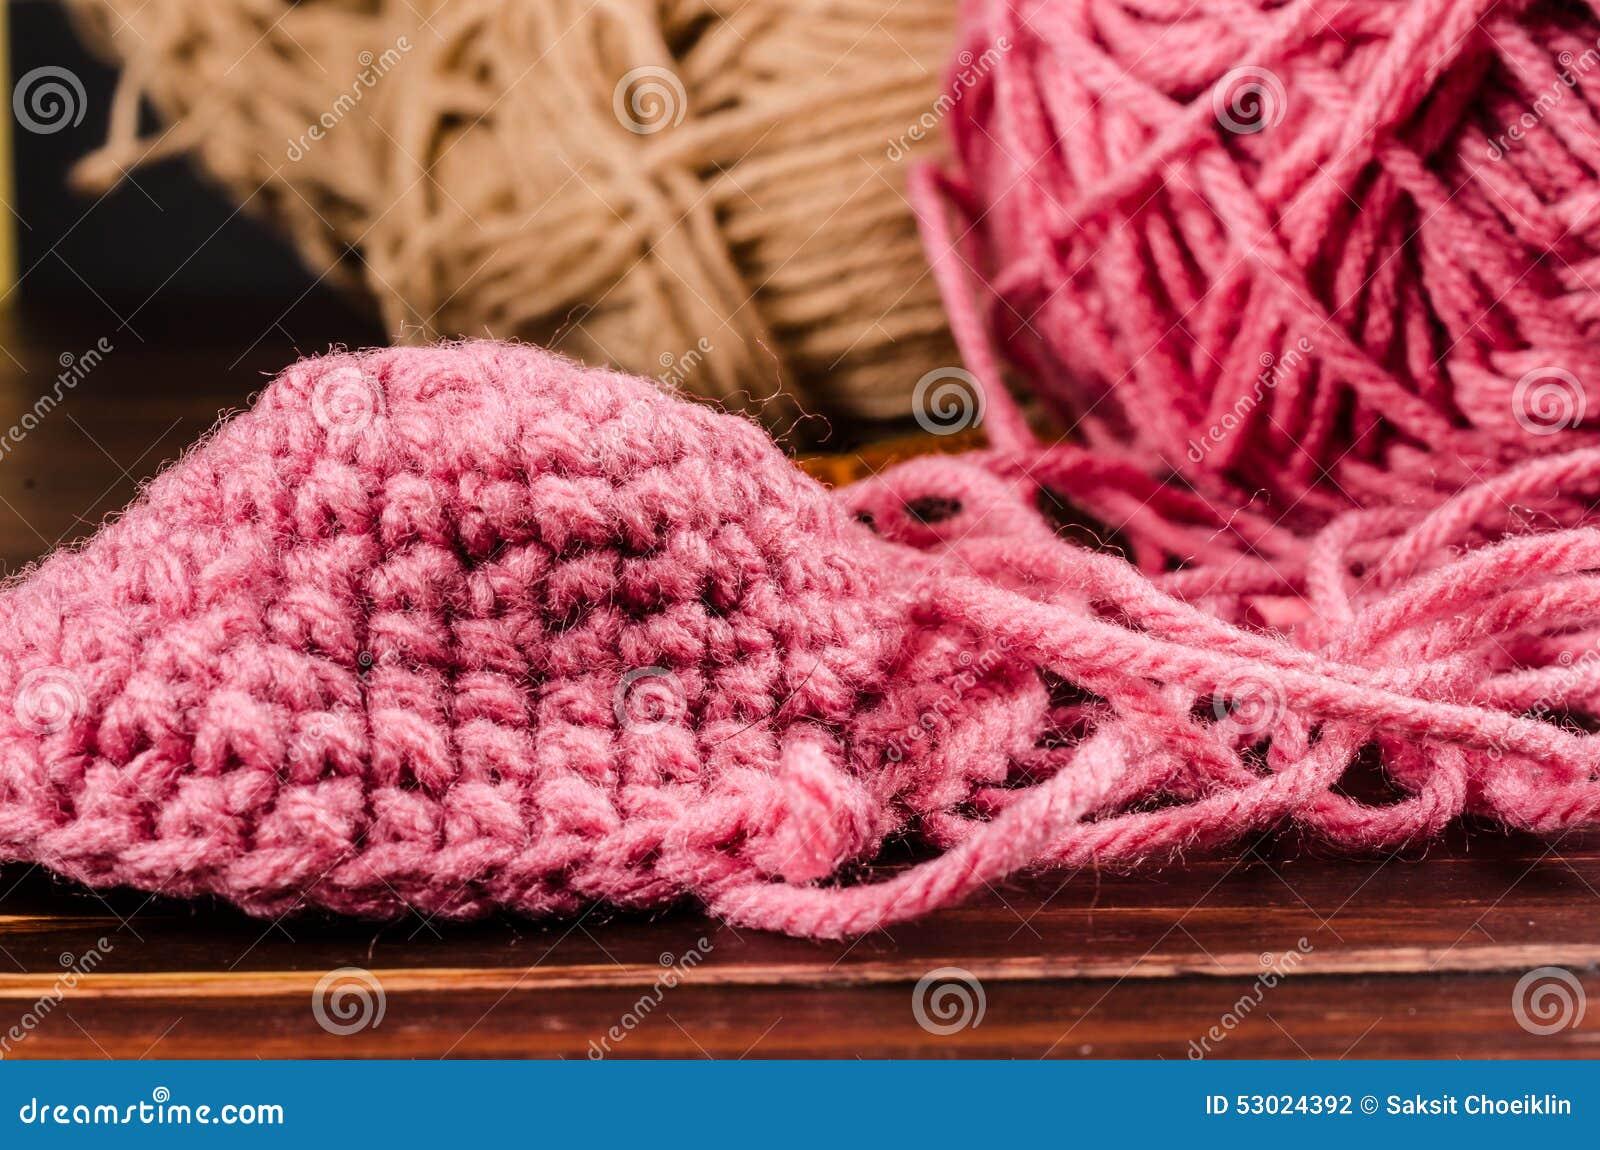 ball of yarn crochet - photo #28